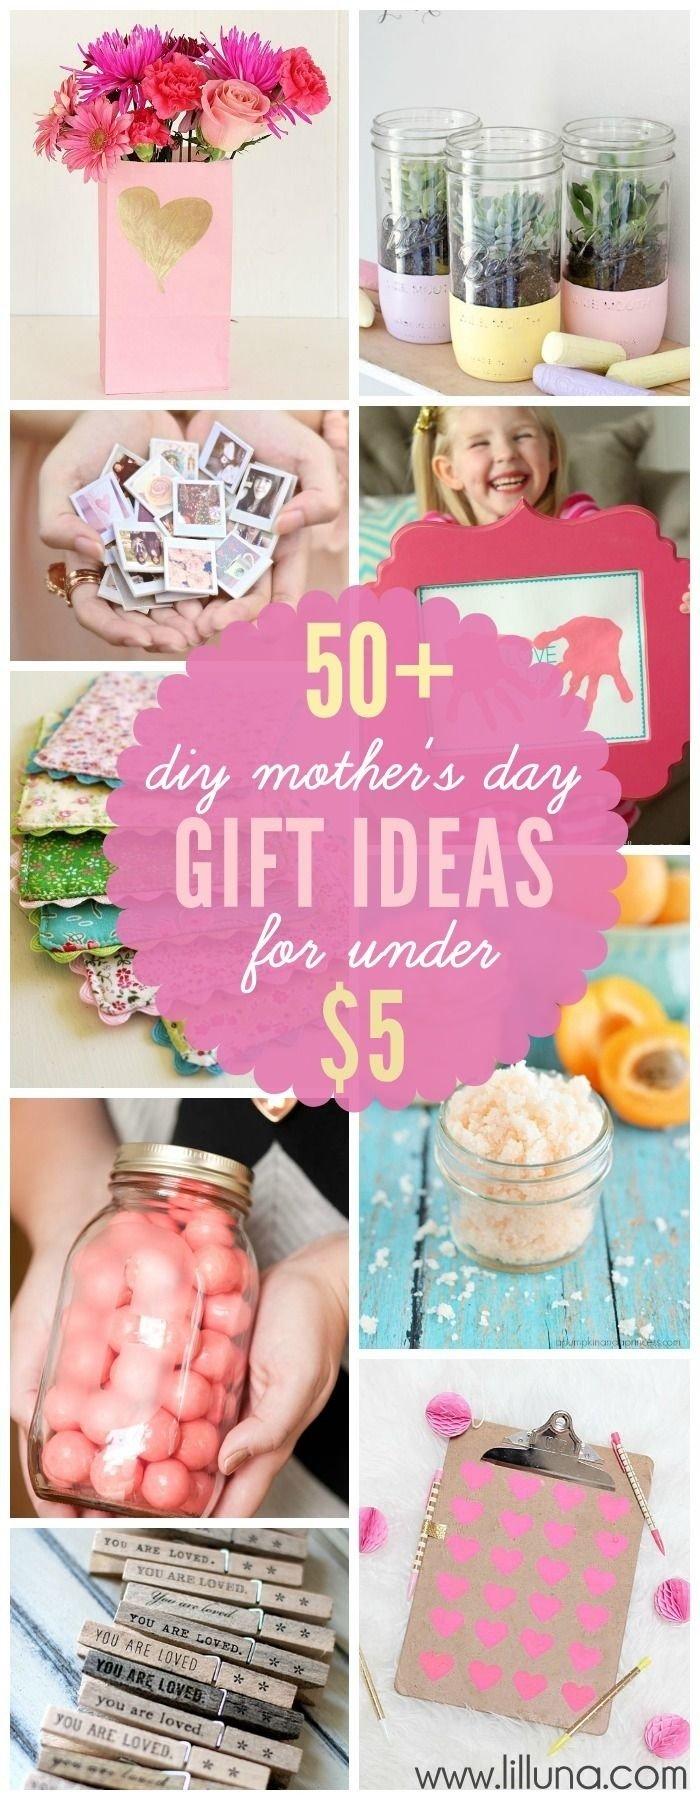 10 Elegant Cheap Mother Day Gift Ideas 201 best mothers day gift ideas images on pinterest gift ideas 1 2021